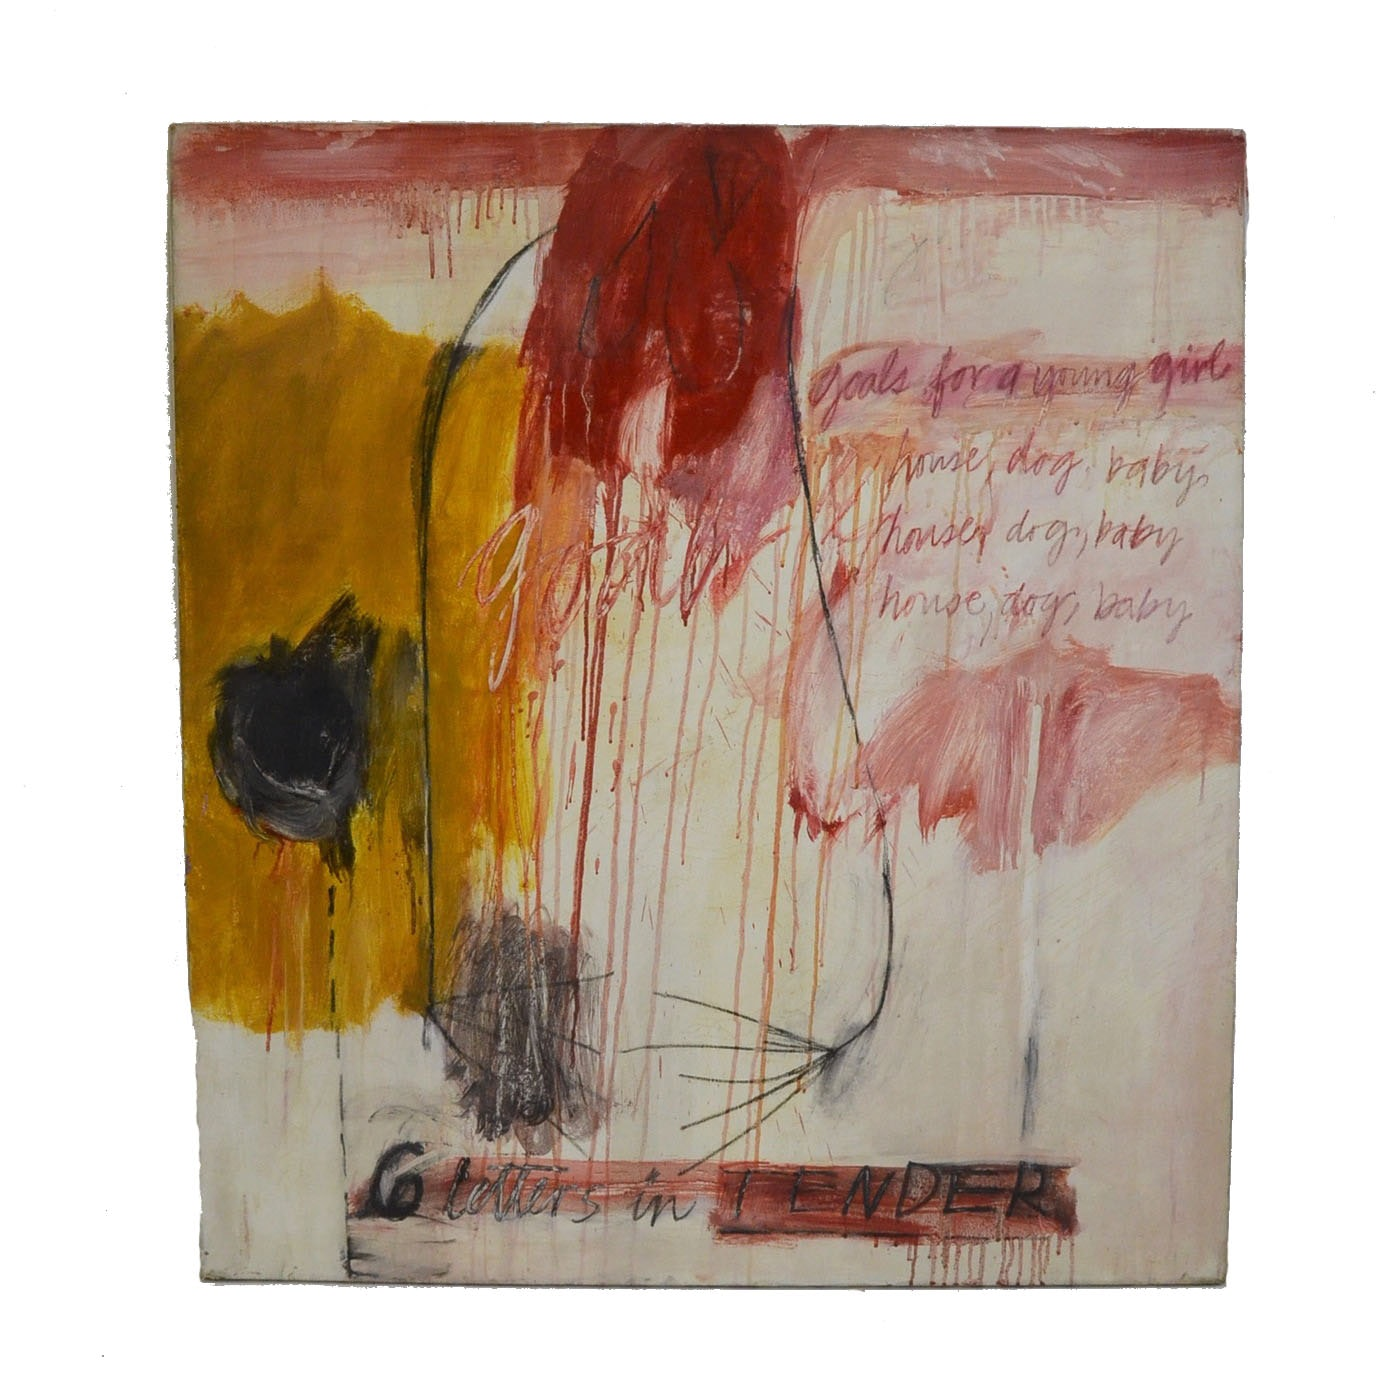 Nicholas Barbieri Mixed Media Painting